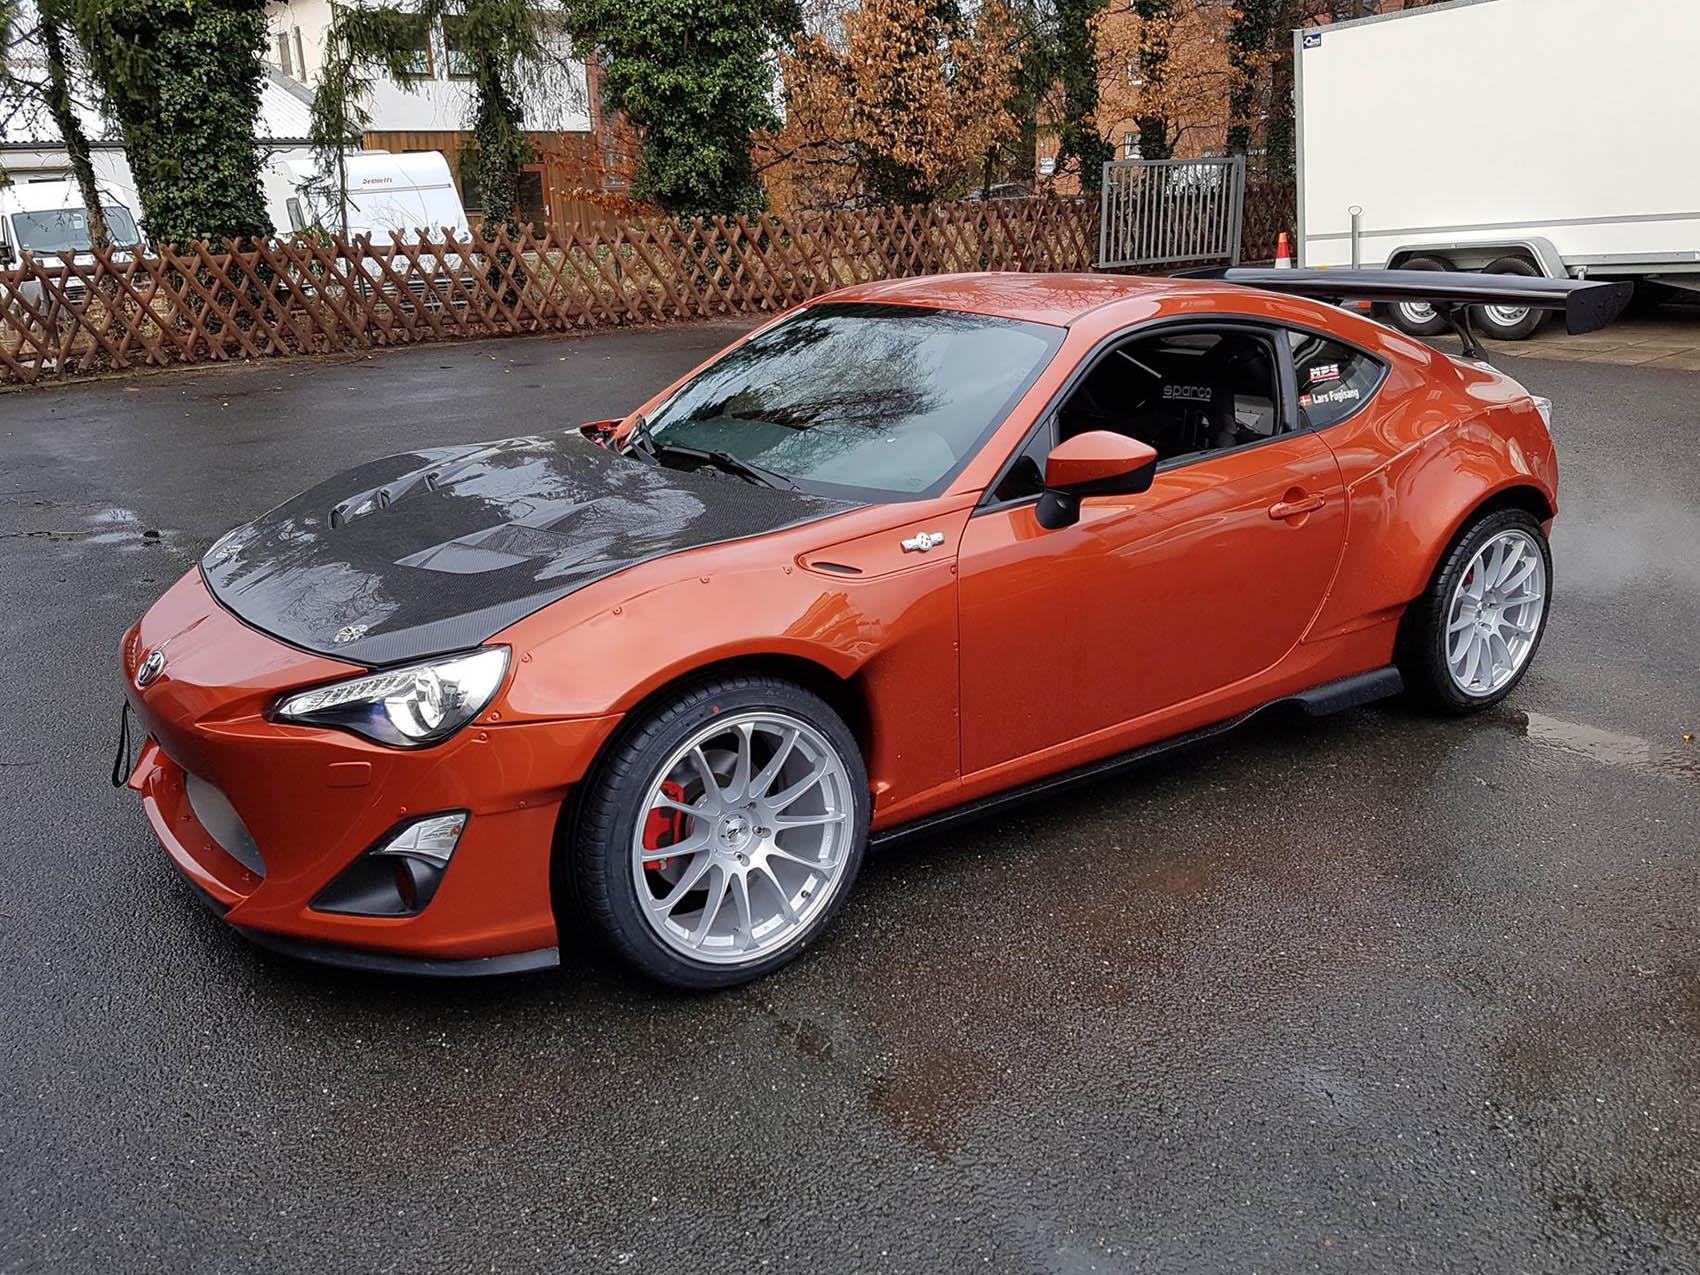 Kelebihan Toyota Gt86 Turbo Spesifikasi